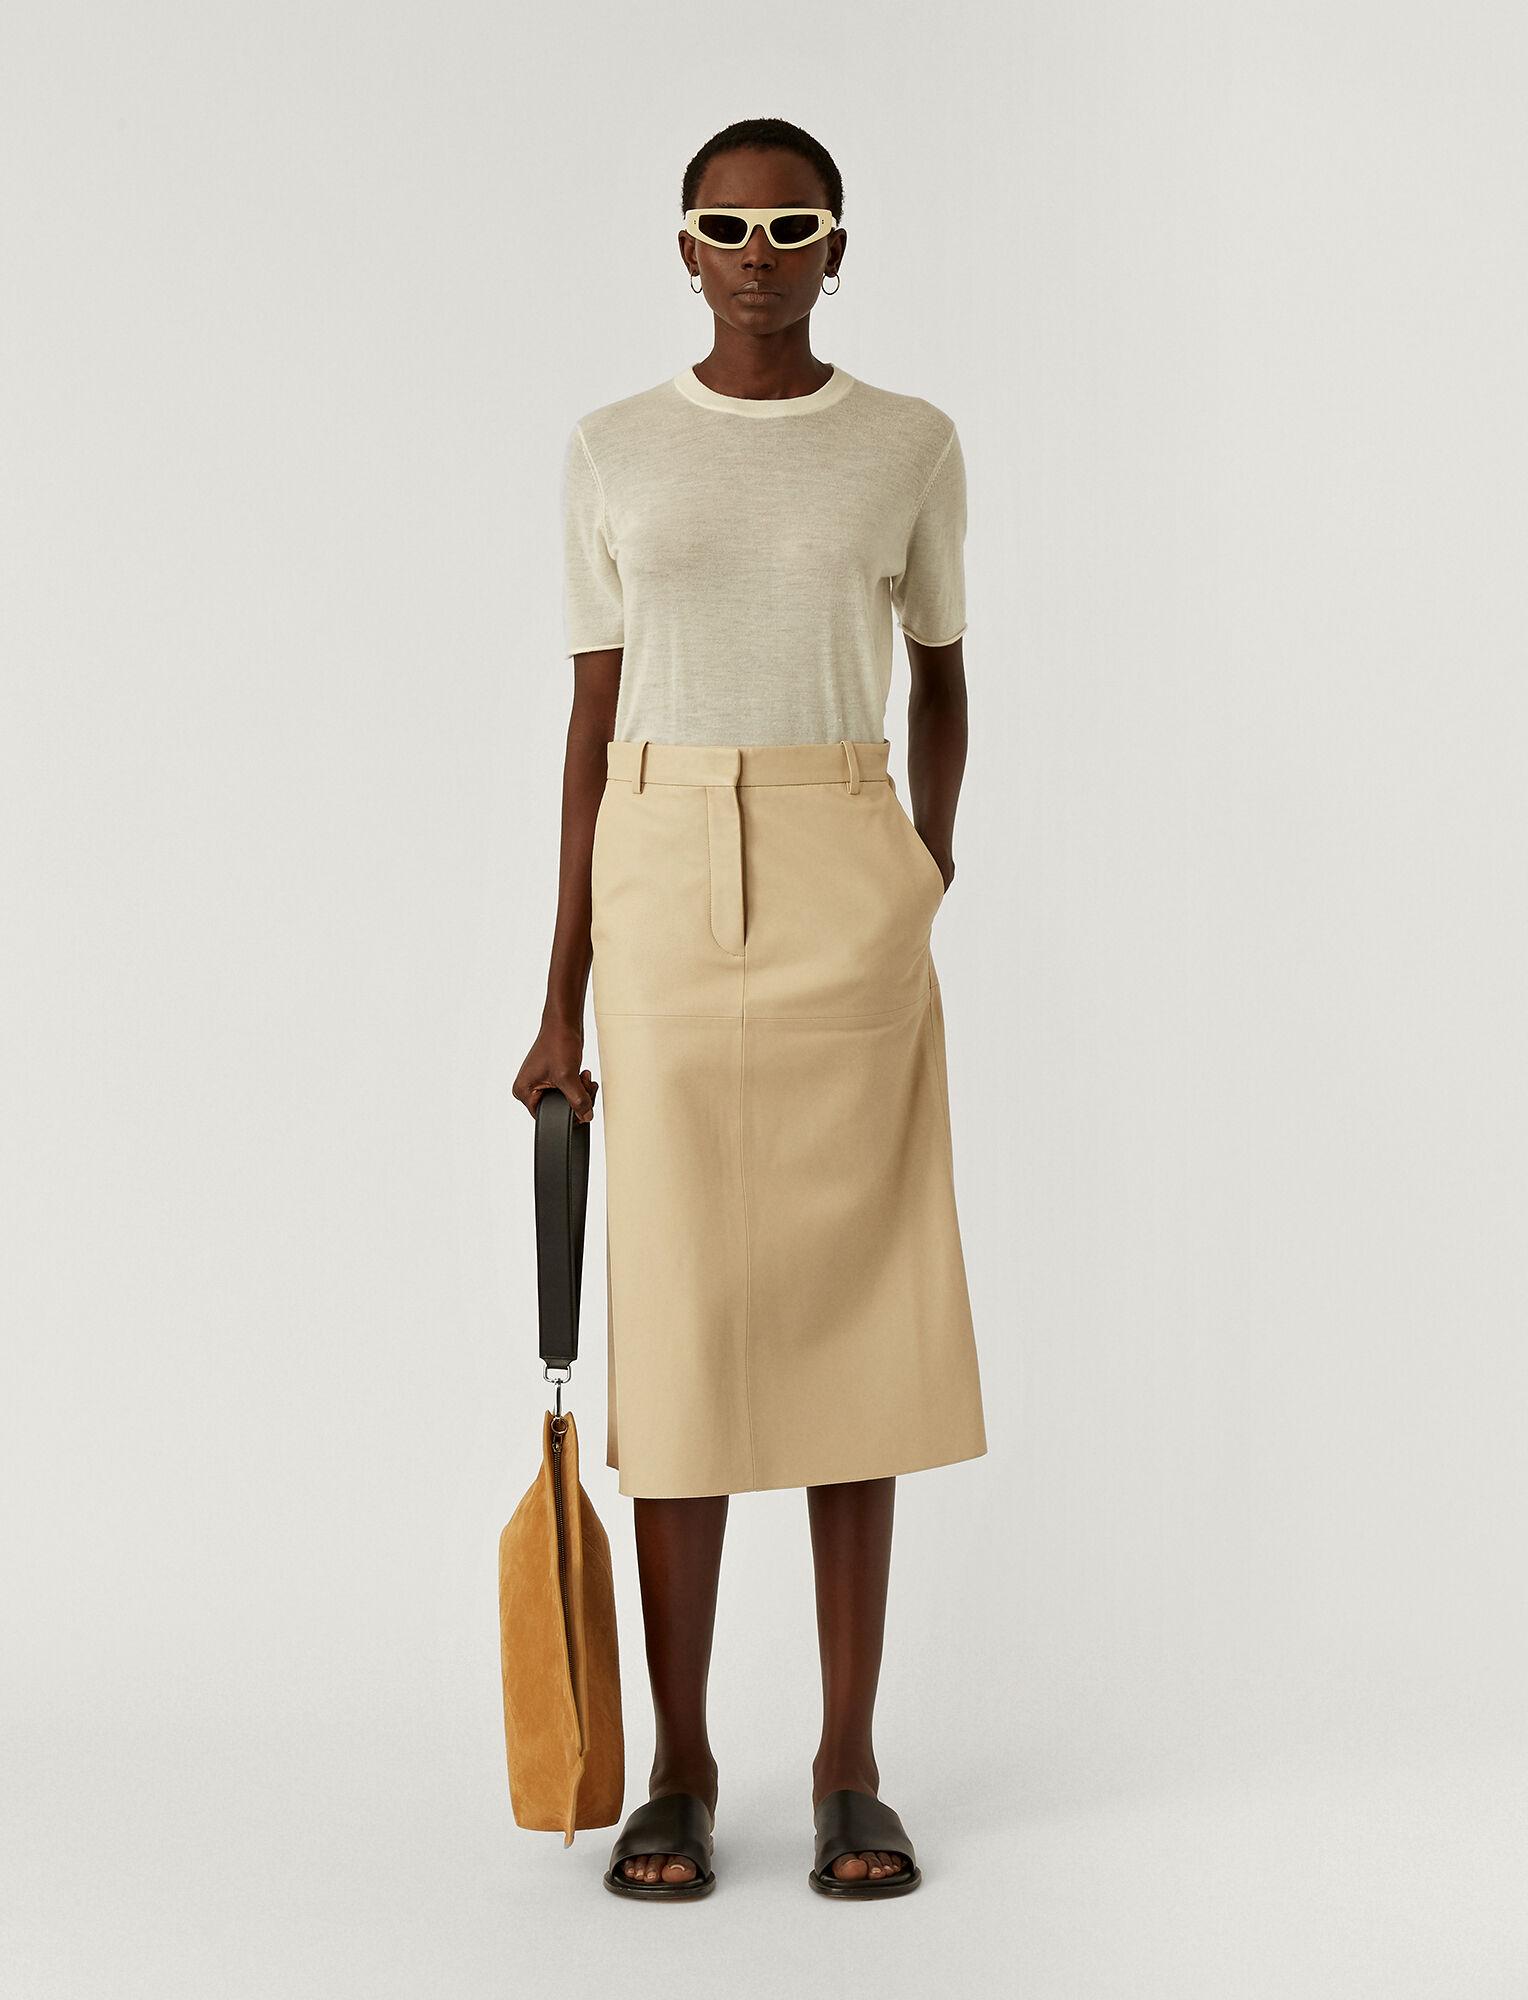 Joseph, Nappa Leather Salva Skirt, in MASTIC